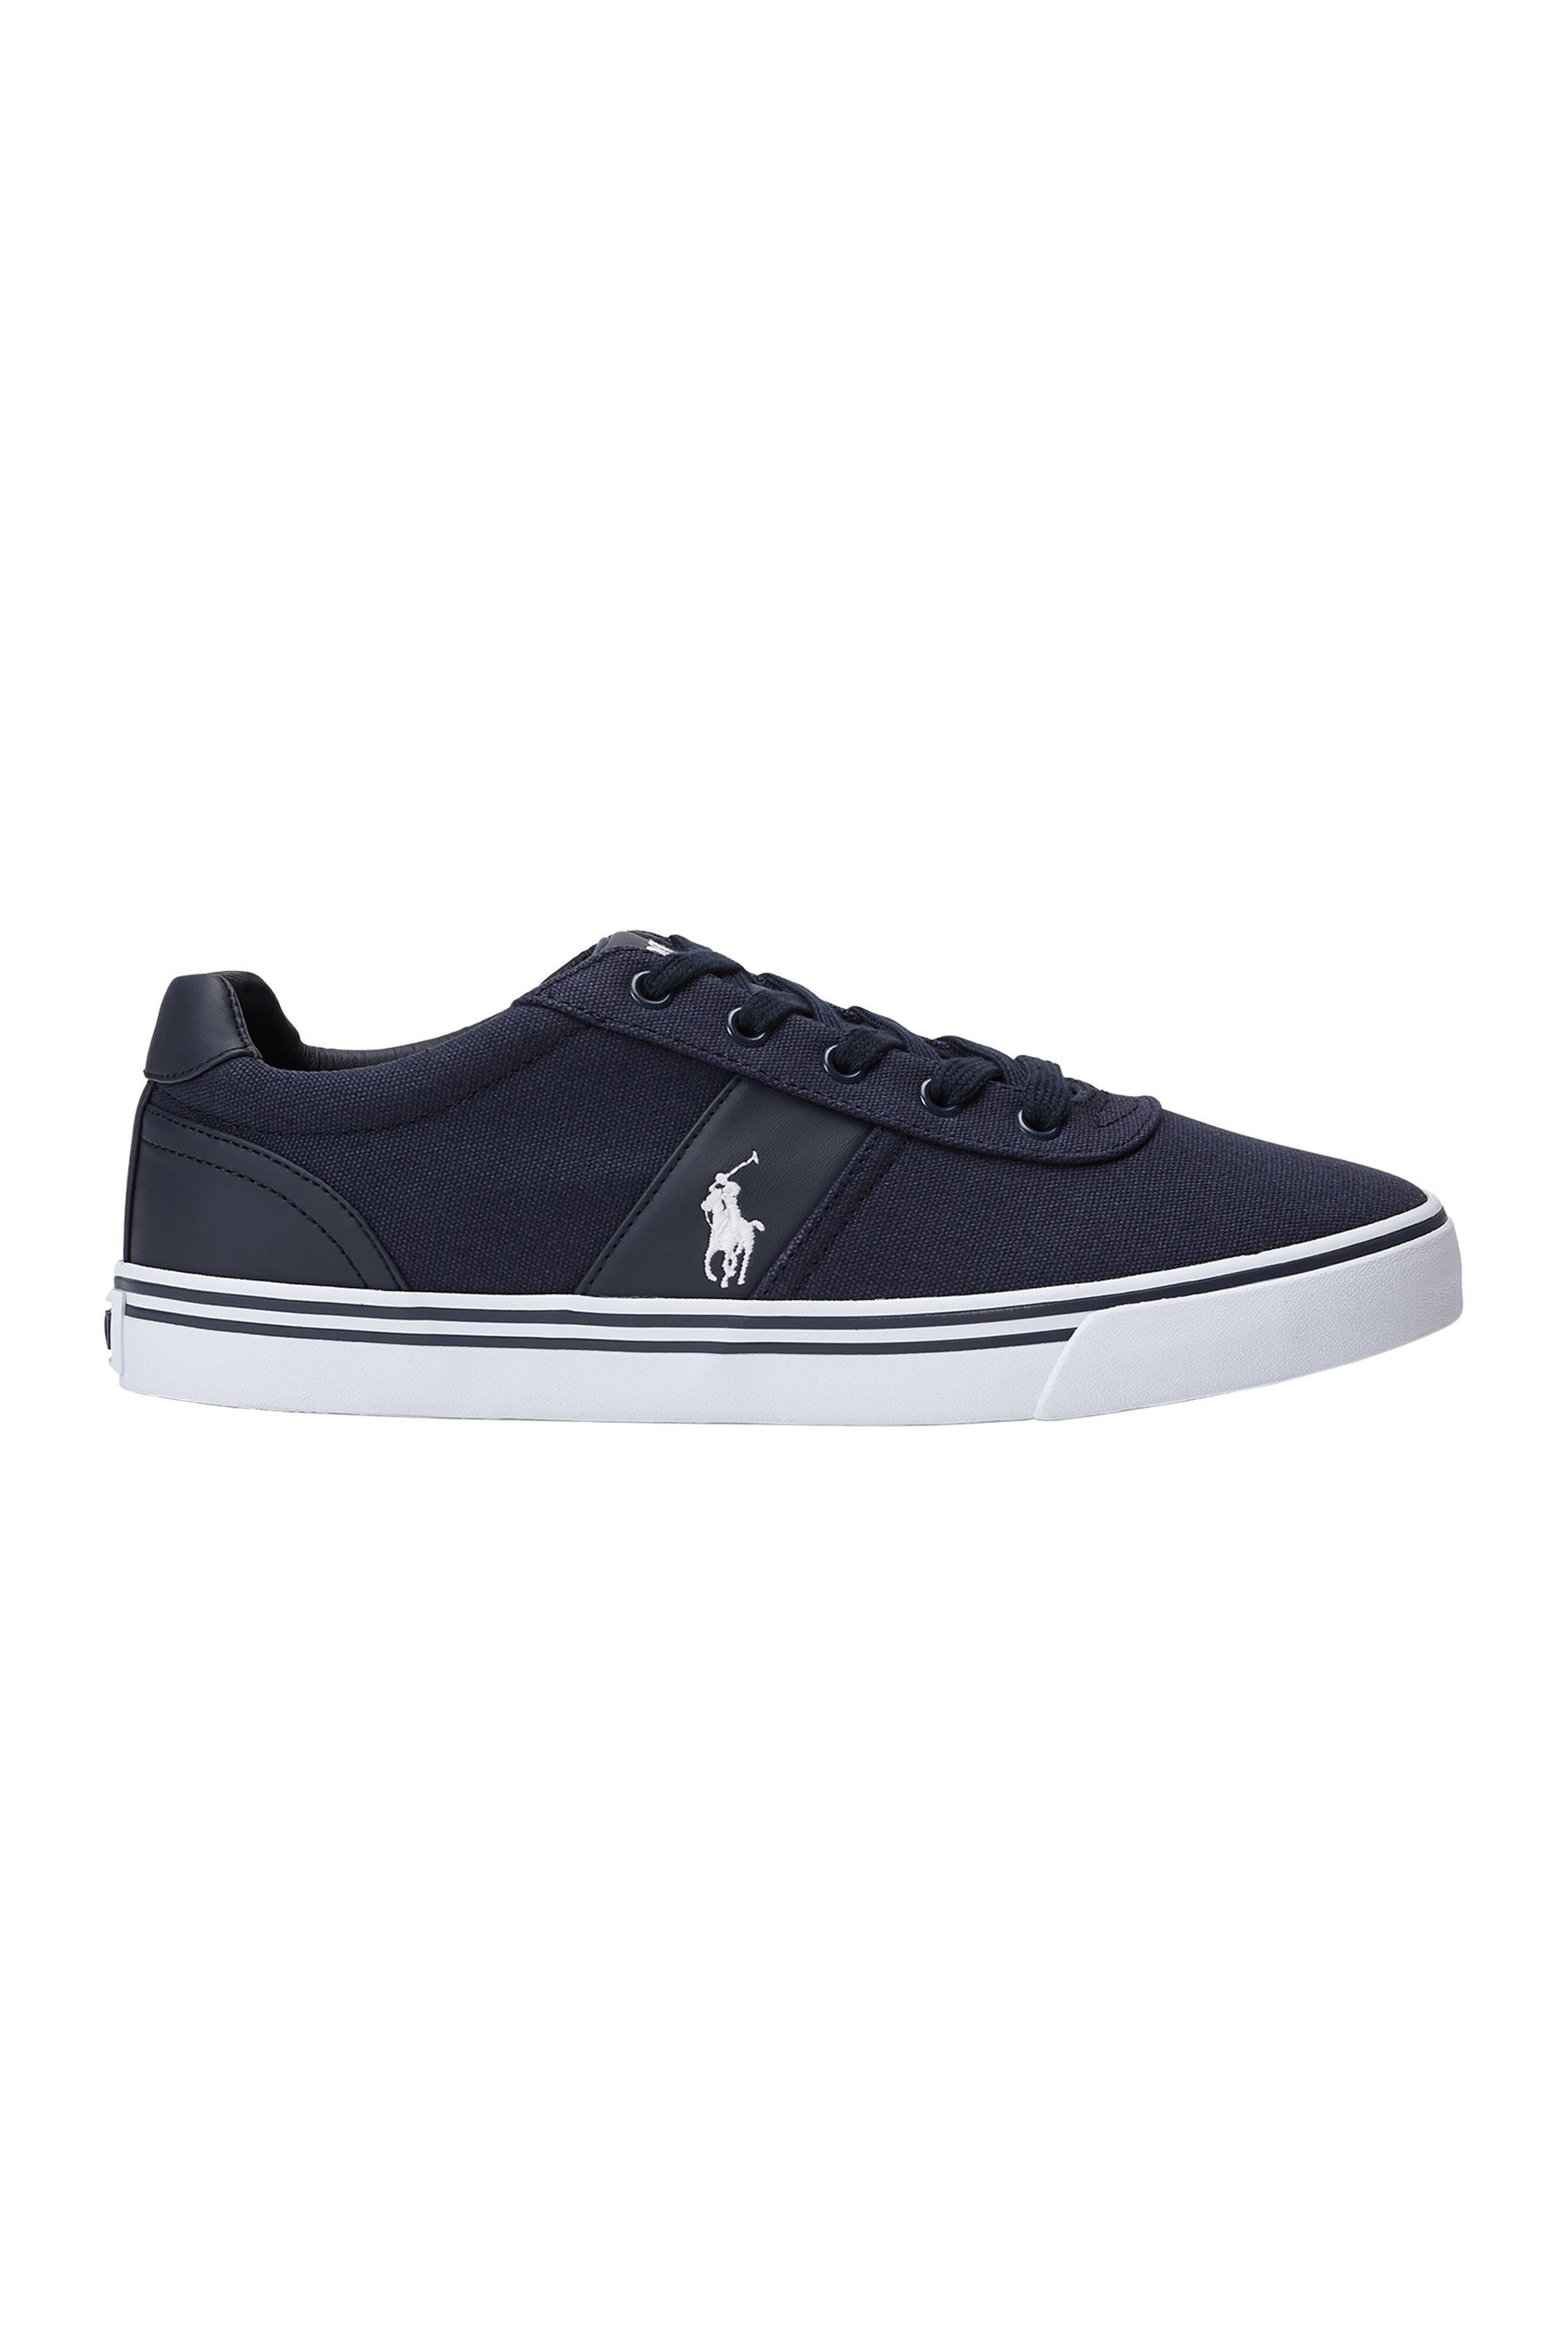 Polo Ralph Lauren ανδρικά sneakers υφασμάτινα Hanford – 816176919899 – Μπλε Σκούρο